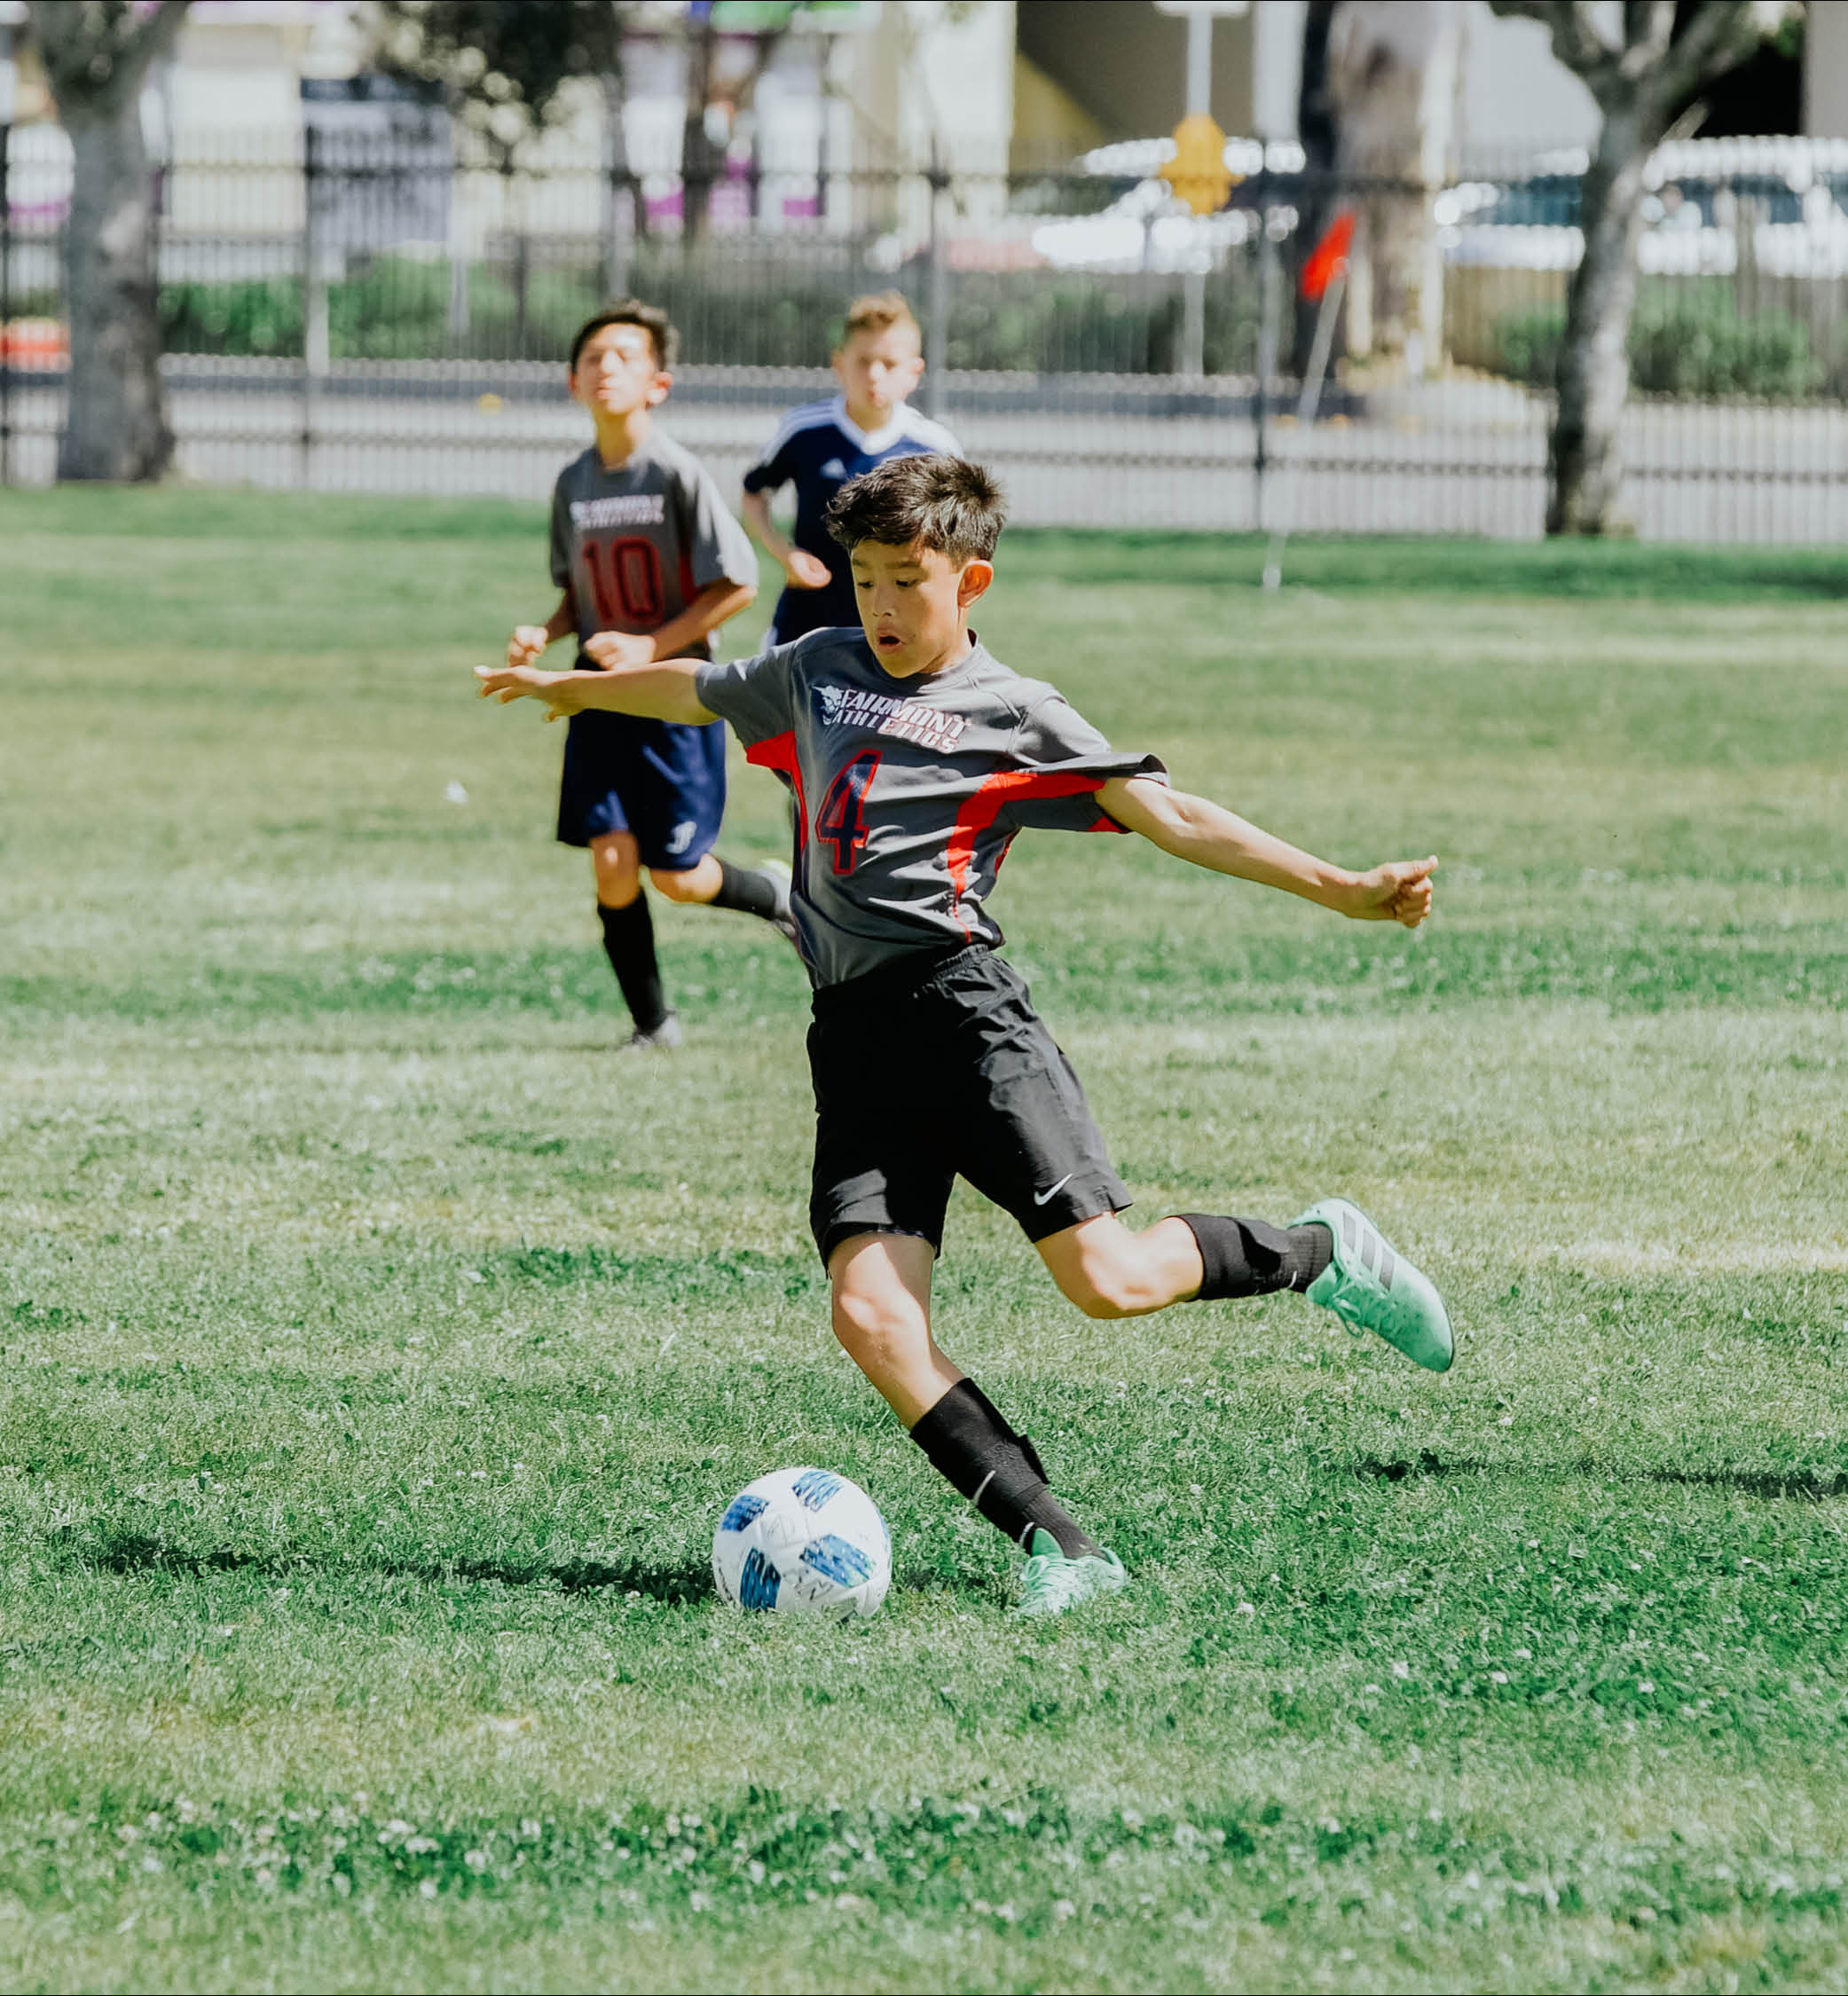 Elementary & Middle School Athletics